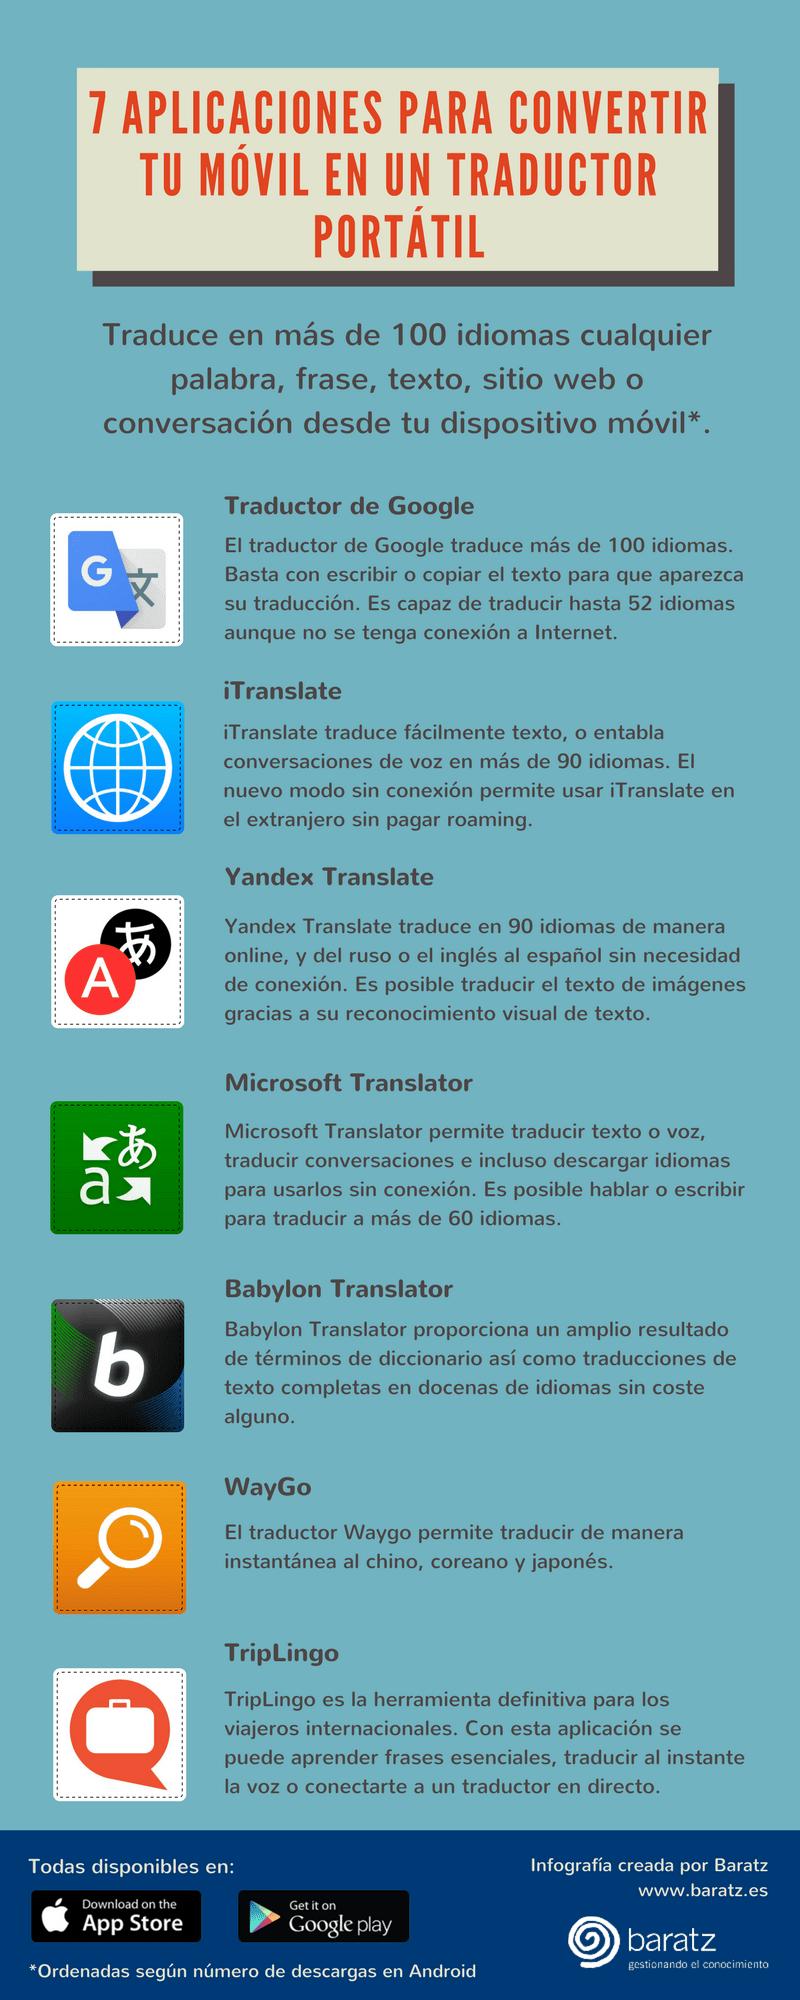 Traductor de textos de español a ingles